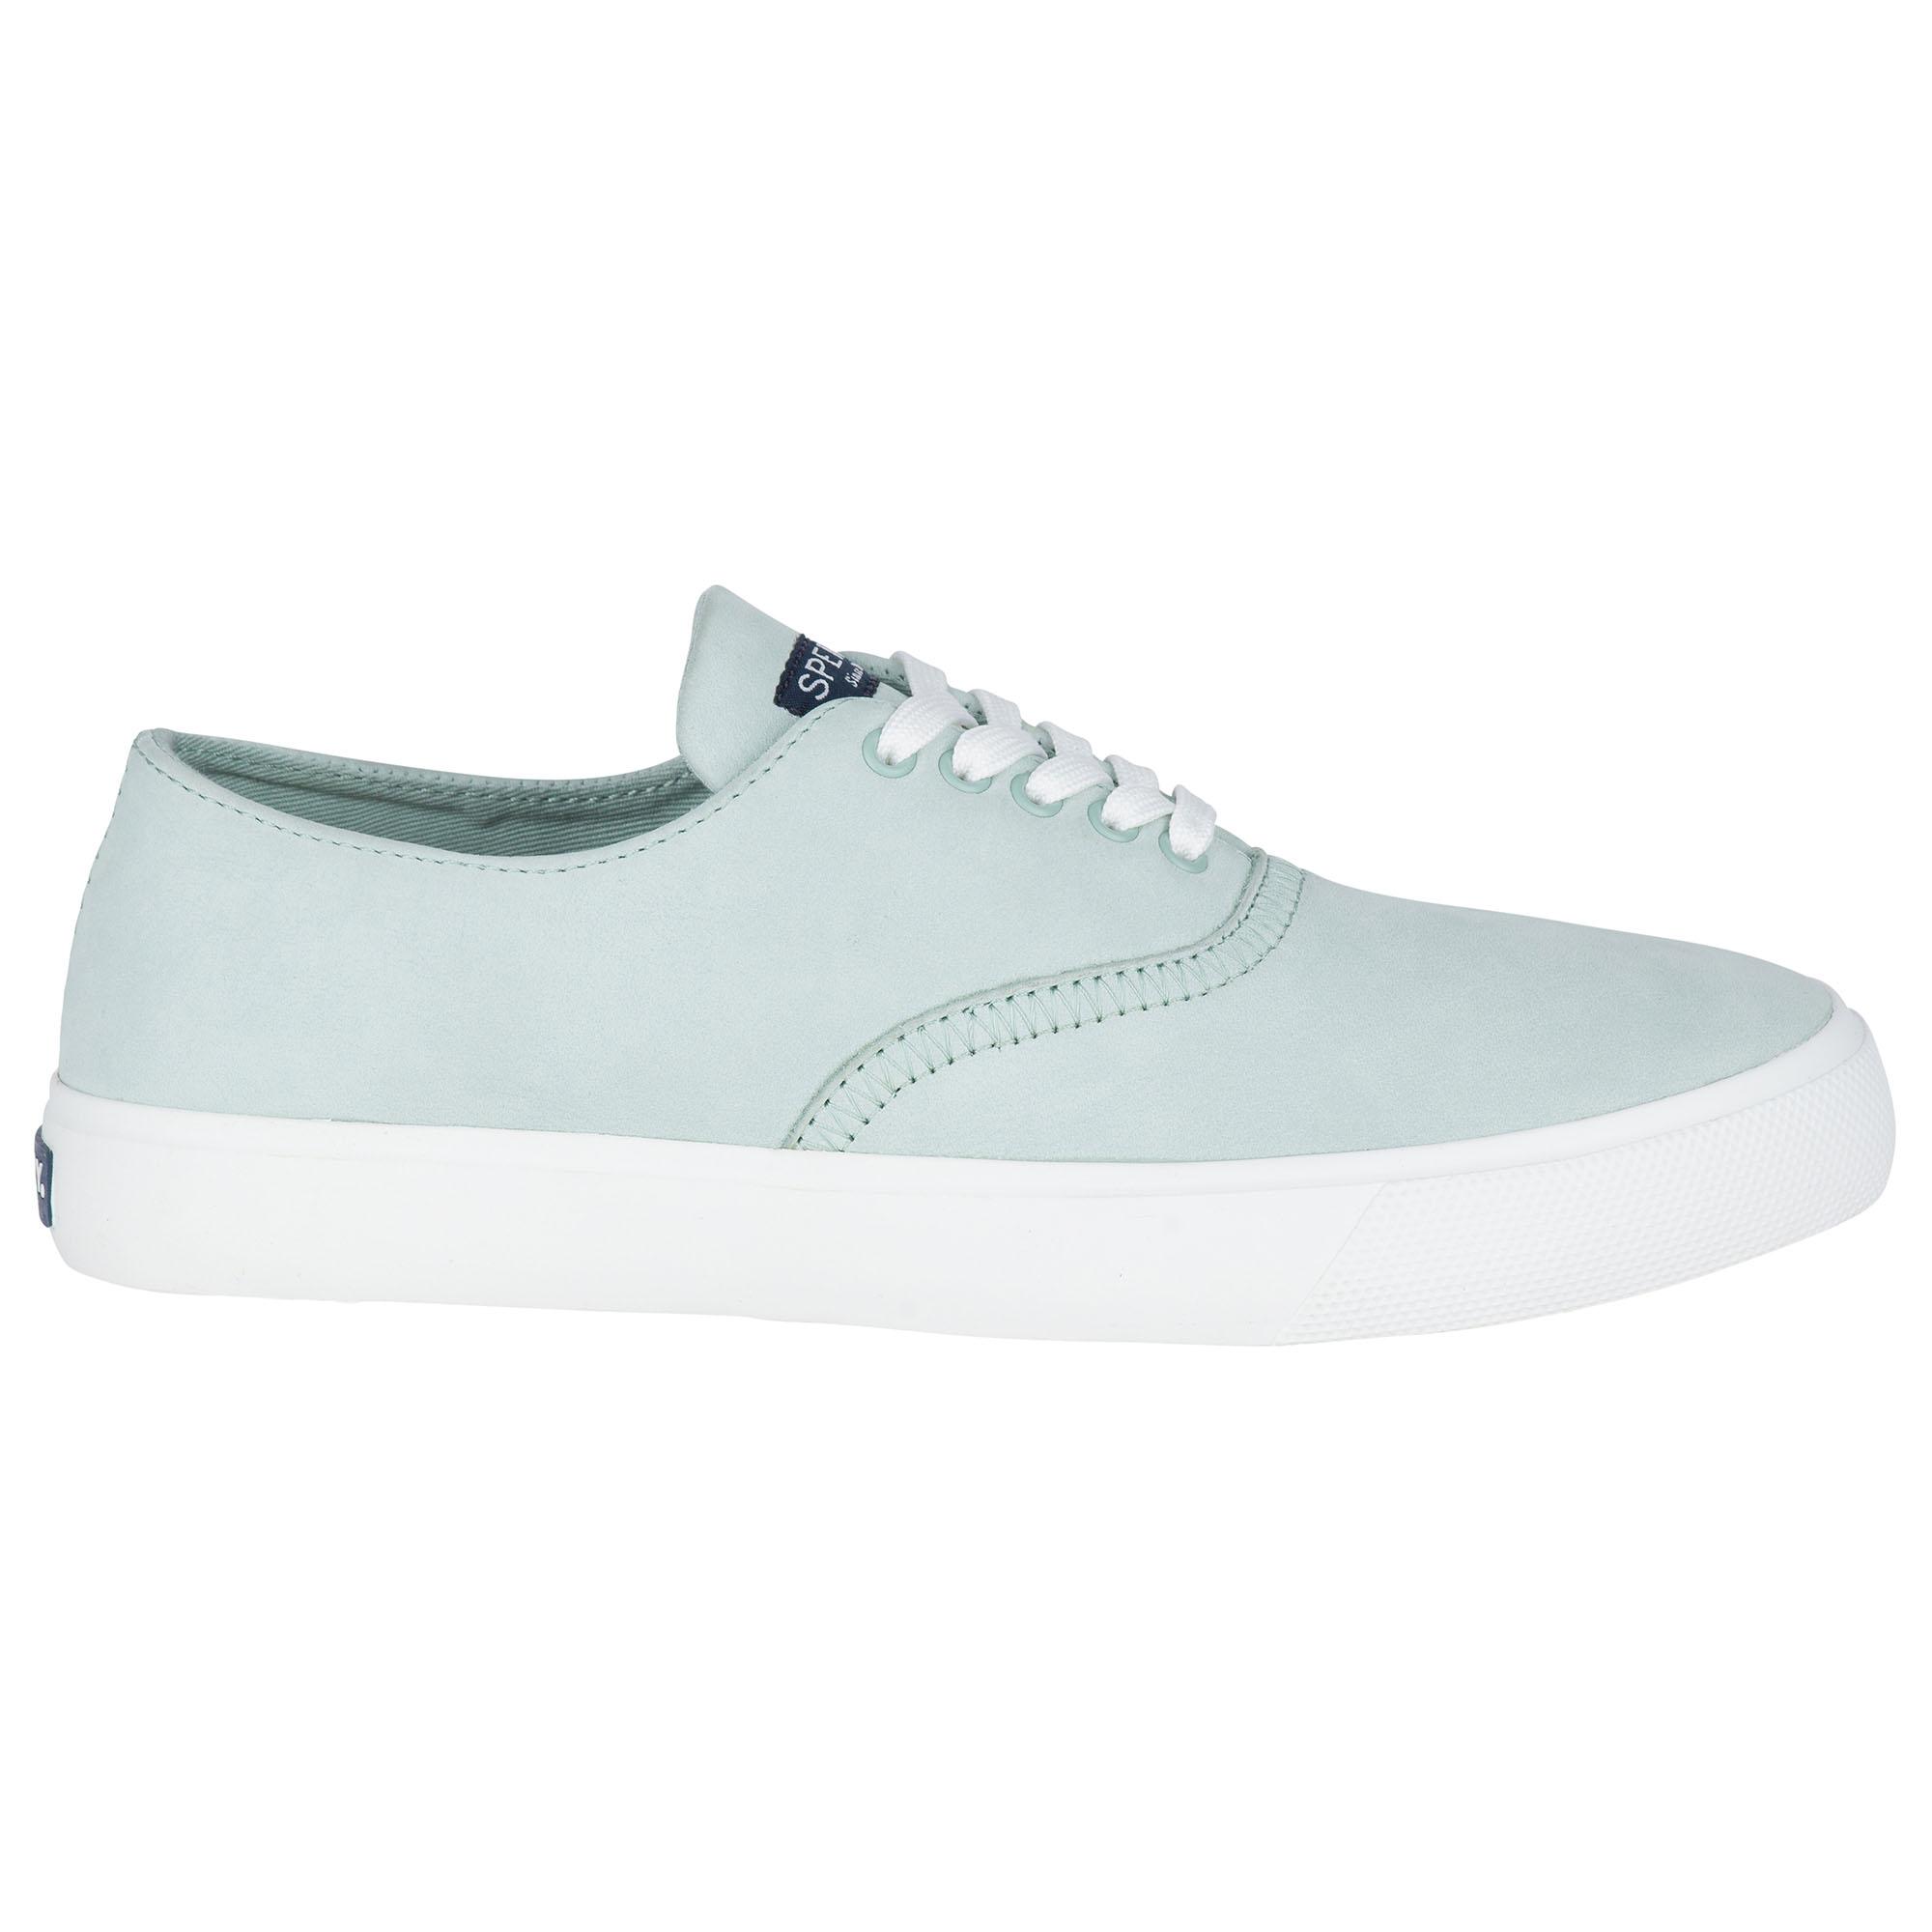 3cd2e24b4e38b Sperry Women's Captain's CVO Washable Casual Shoes